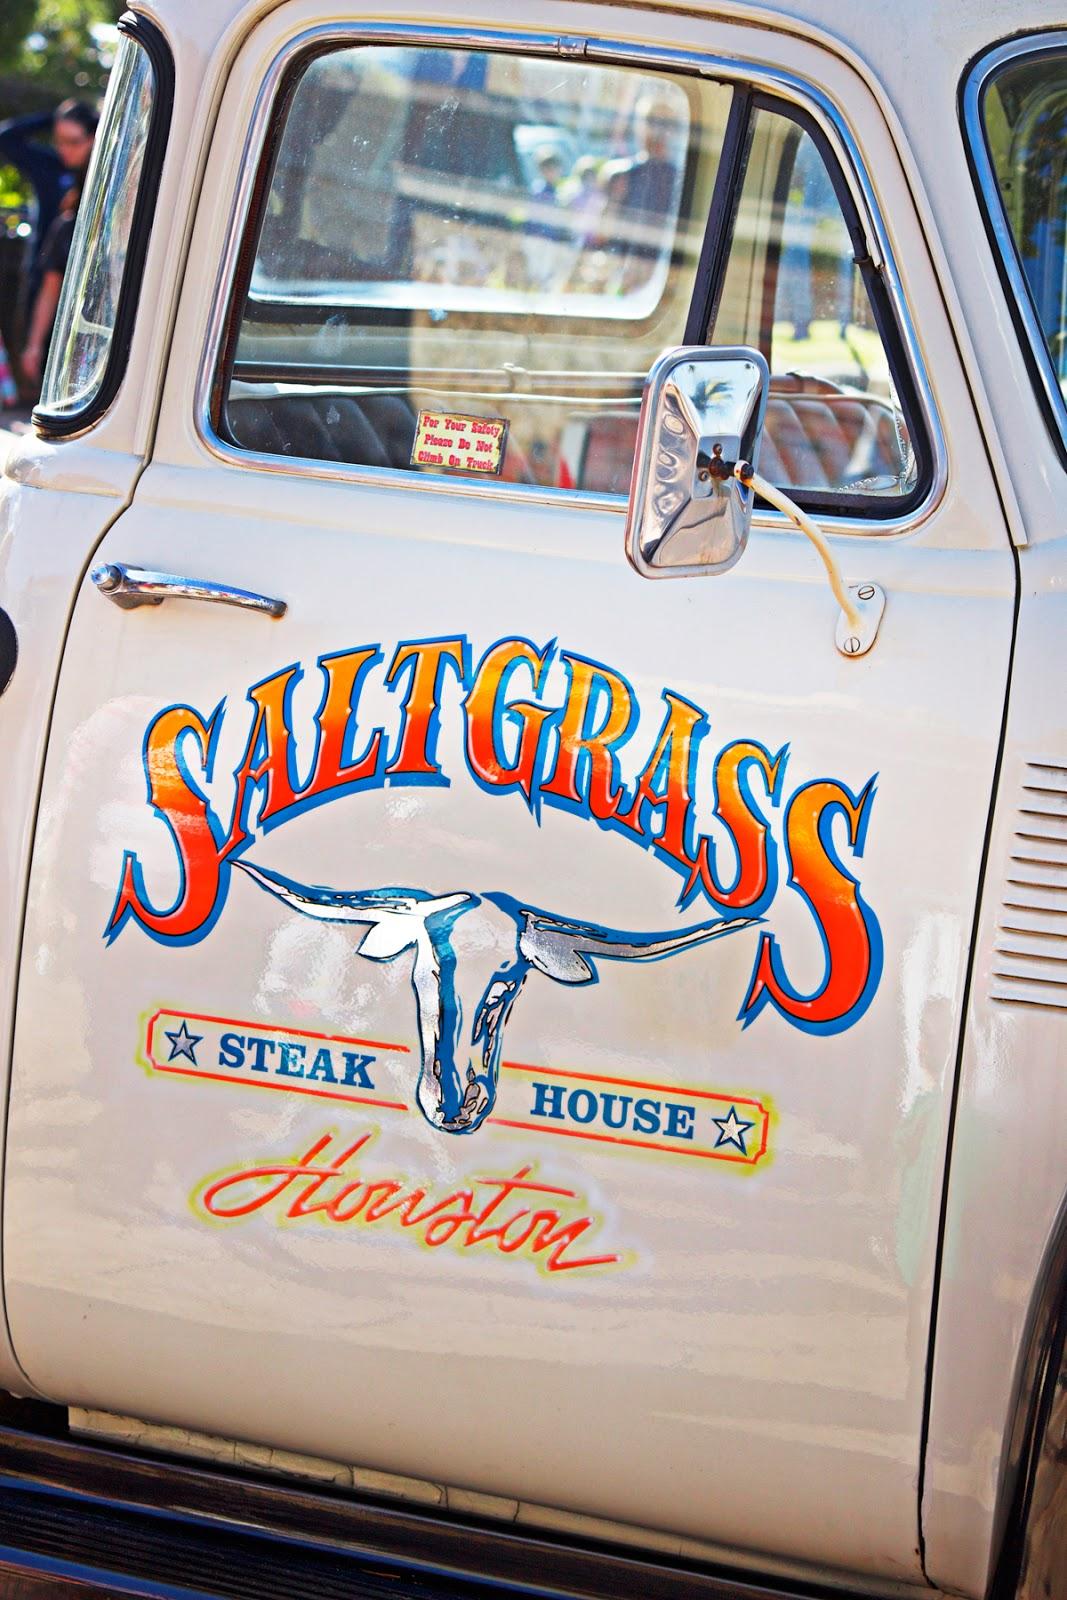 old chevy saltgrass steak house texas